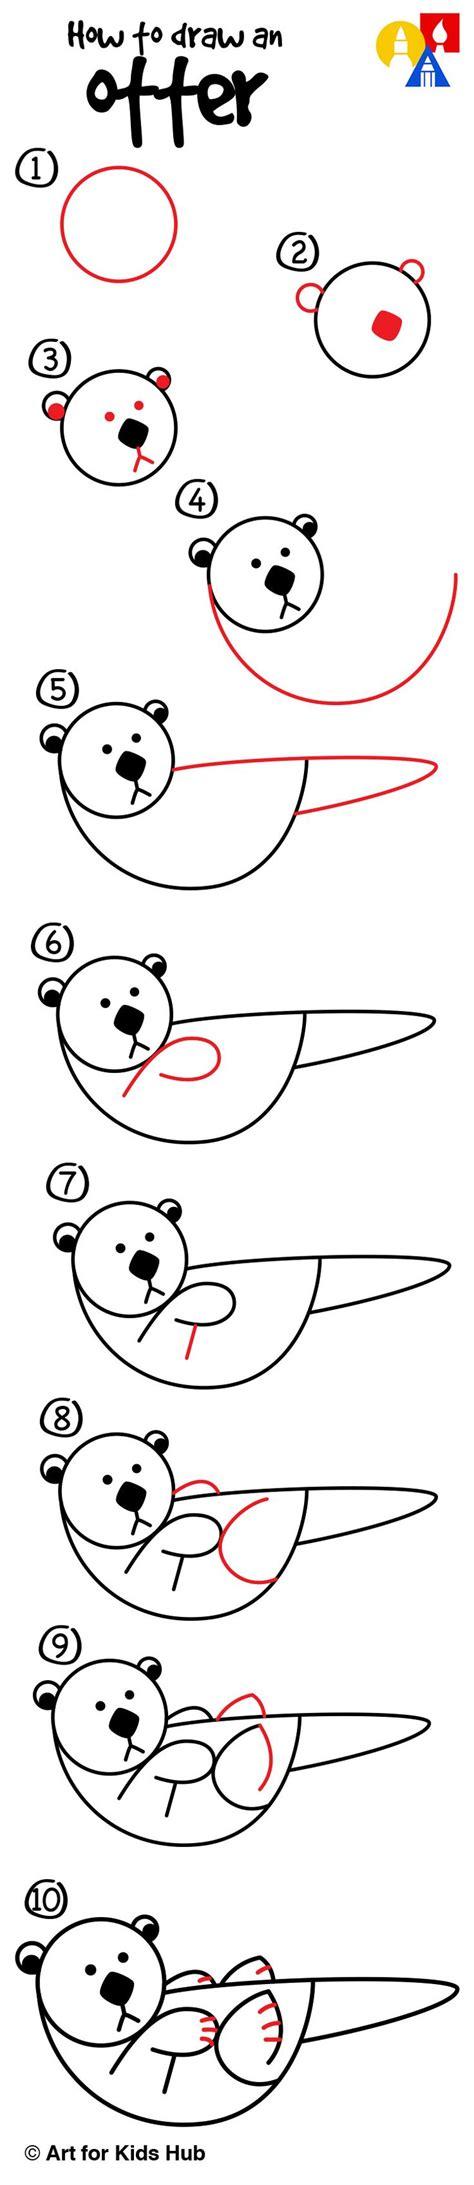 How To Draw An Otter how to draw an otter with shapes for hub